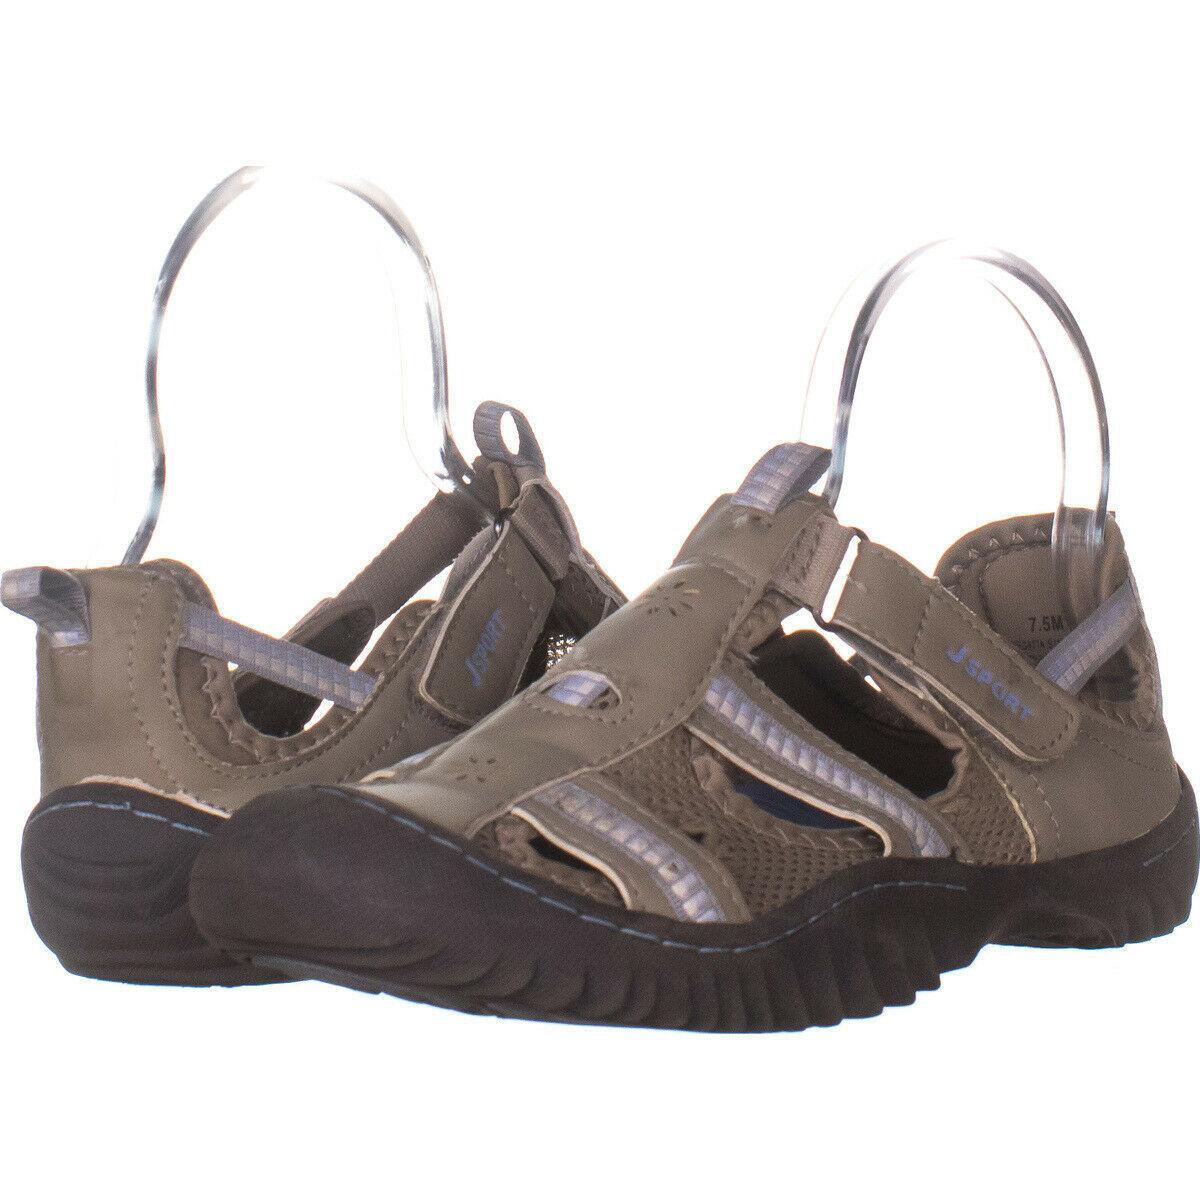 JSport by Jambu Regatta Sport Sandals, Light Grey/Stone Blue 429, Light - $28.79